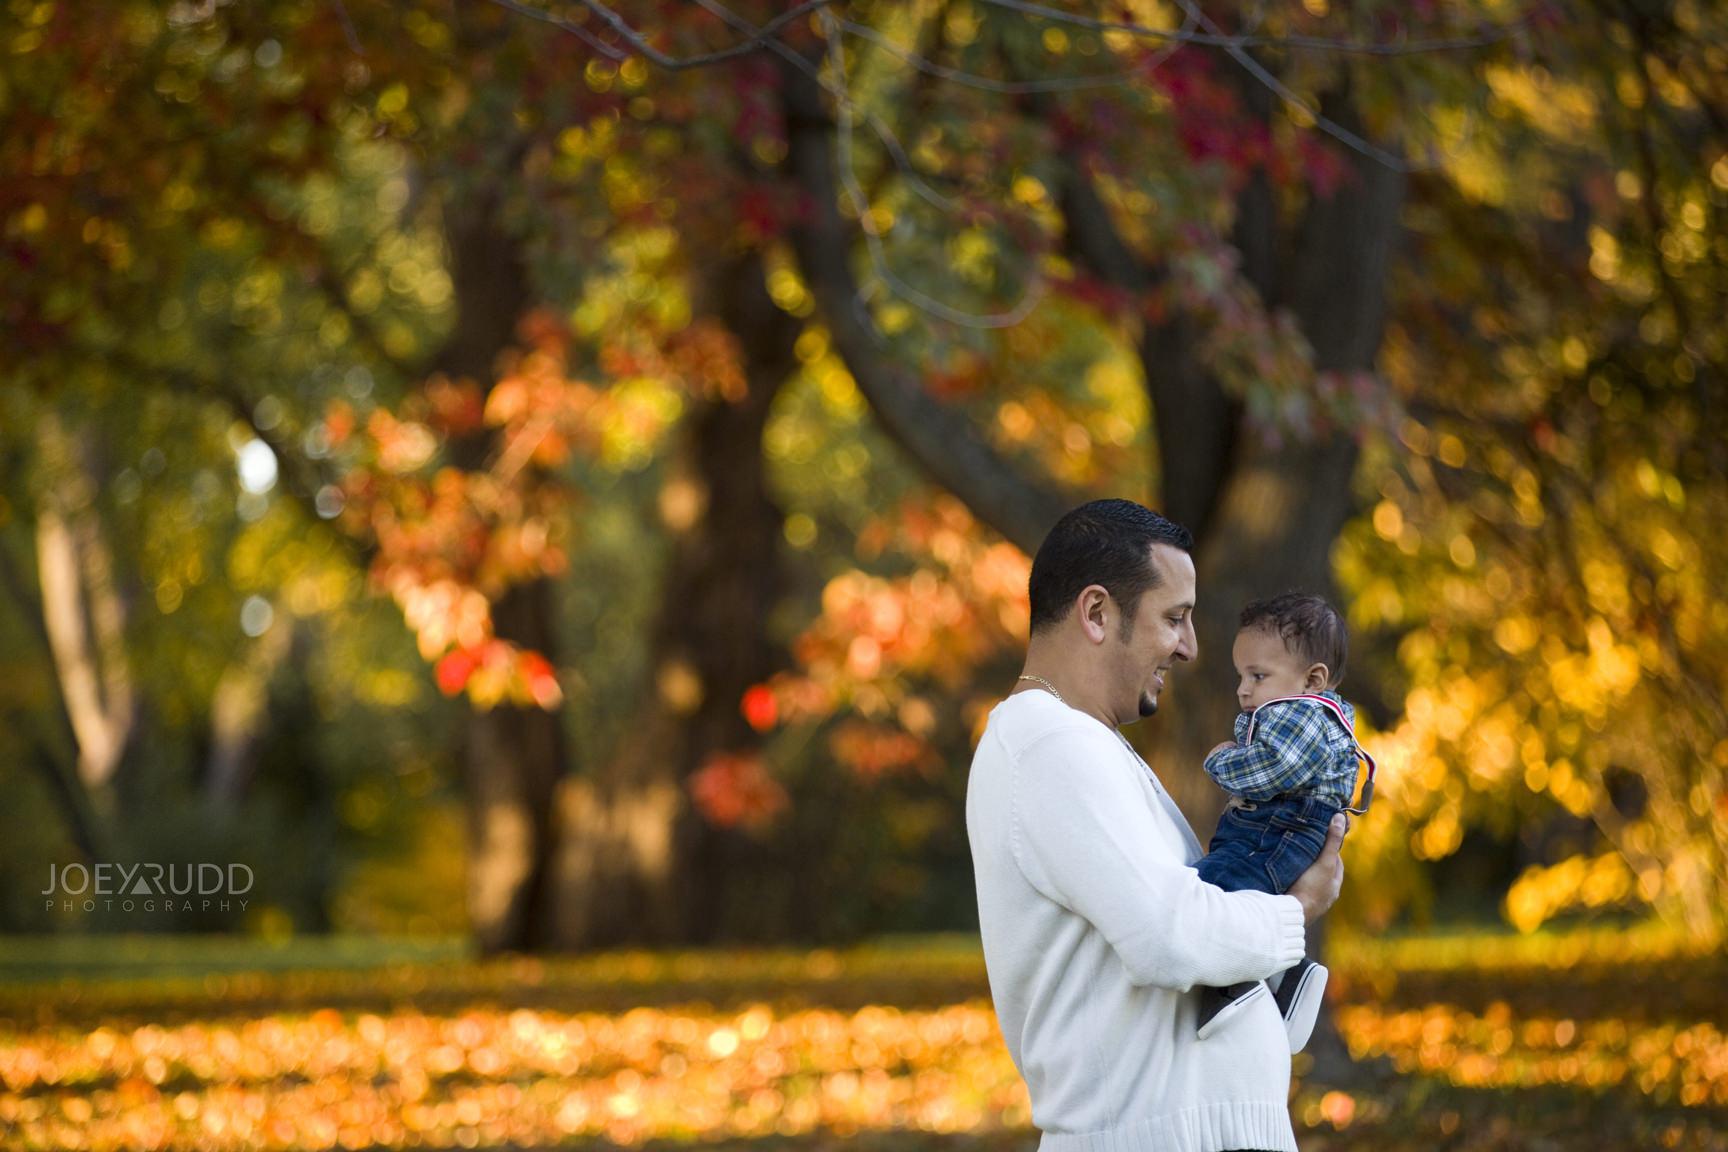 Ottawa Family Photographer Joey Rudd Photography Family Photo Session Arboretum Fall Colours